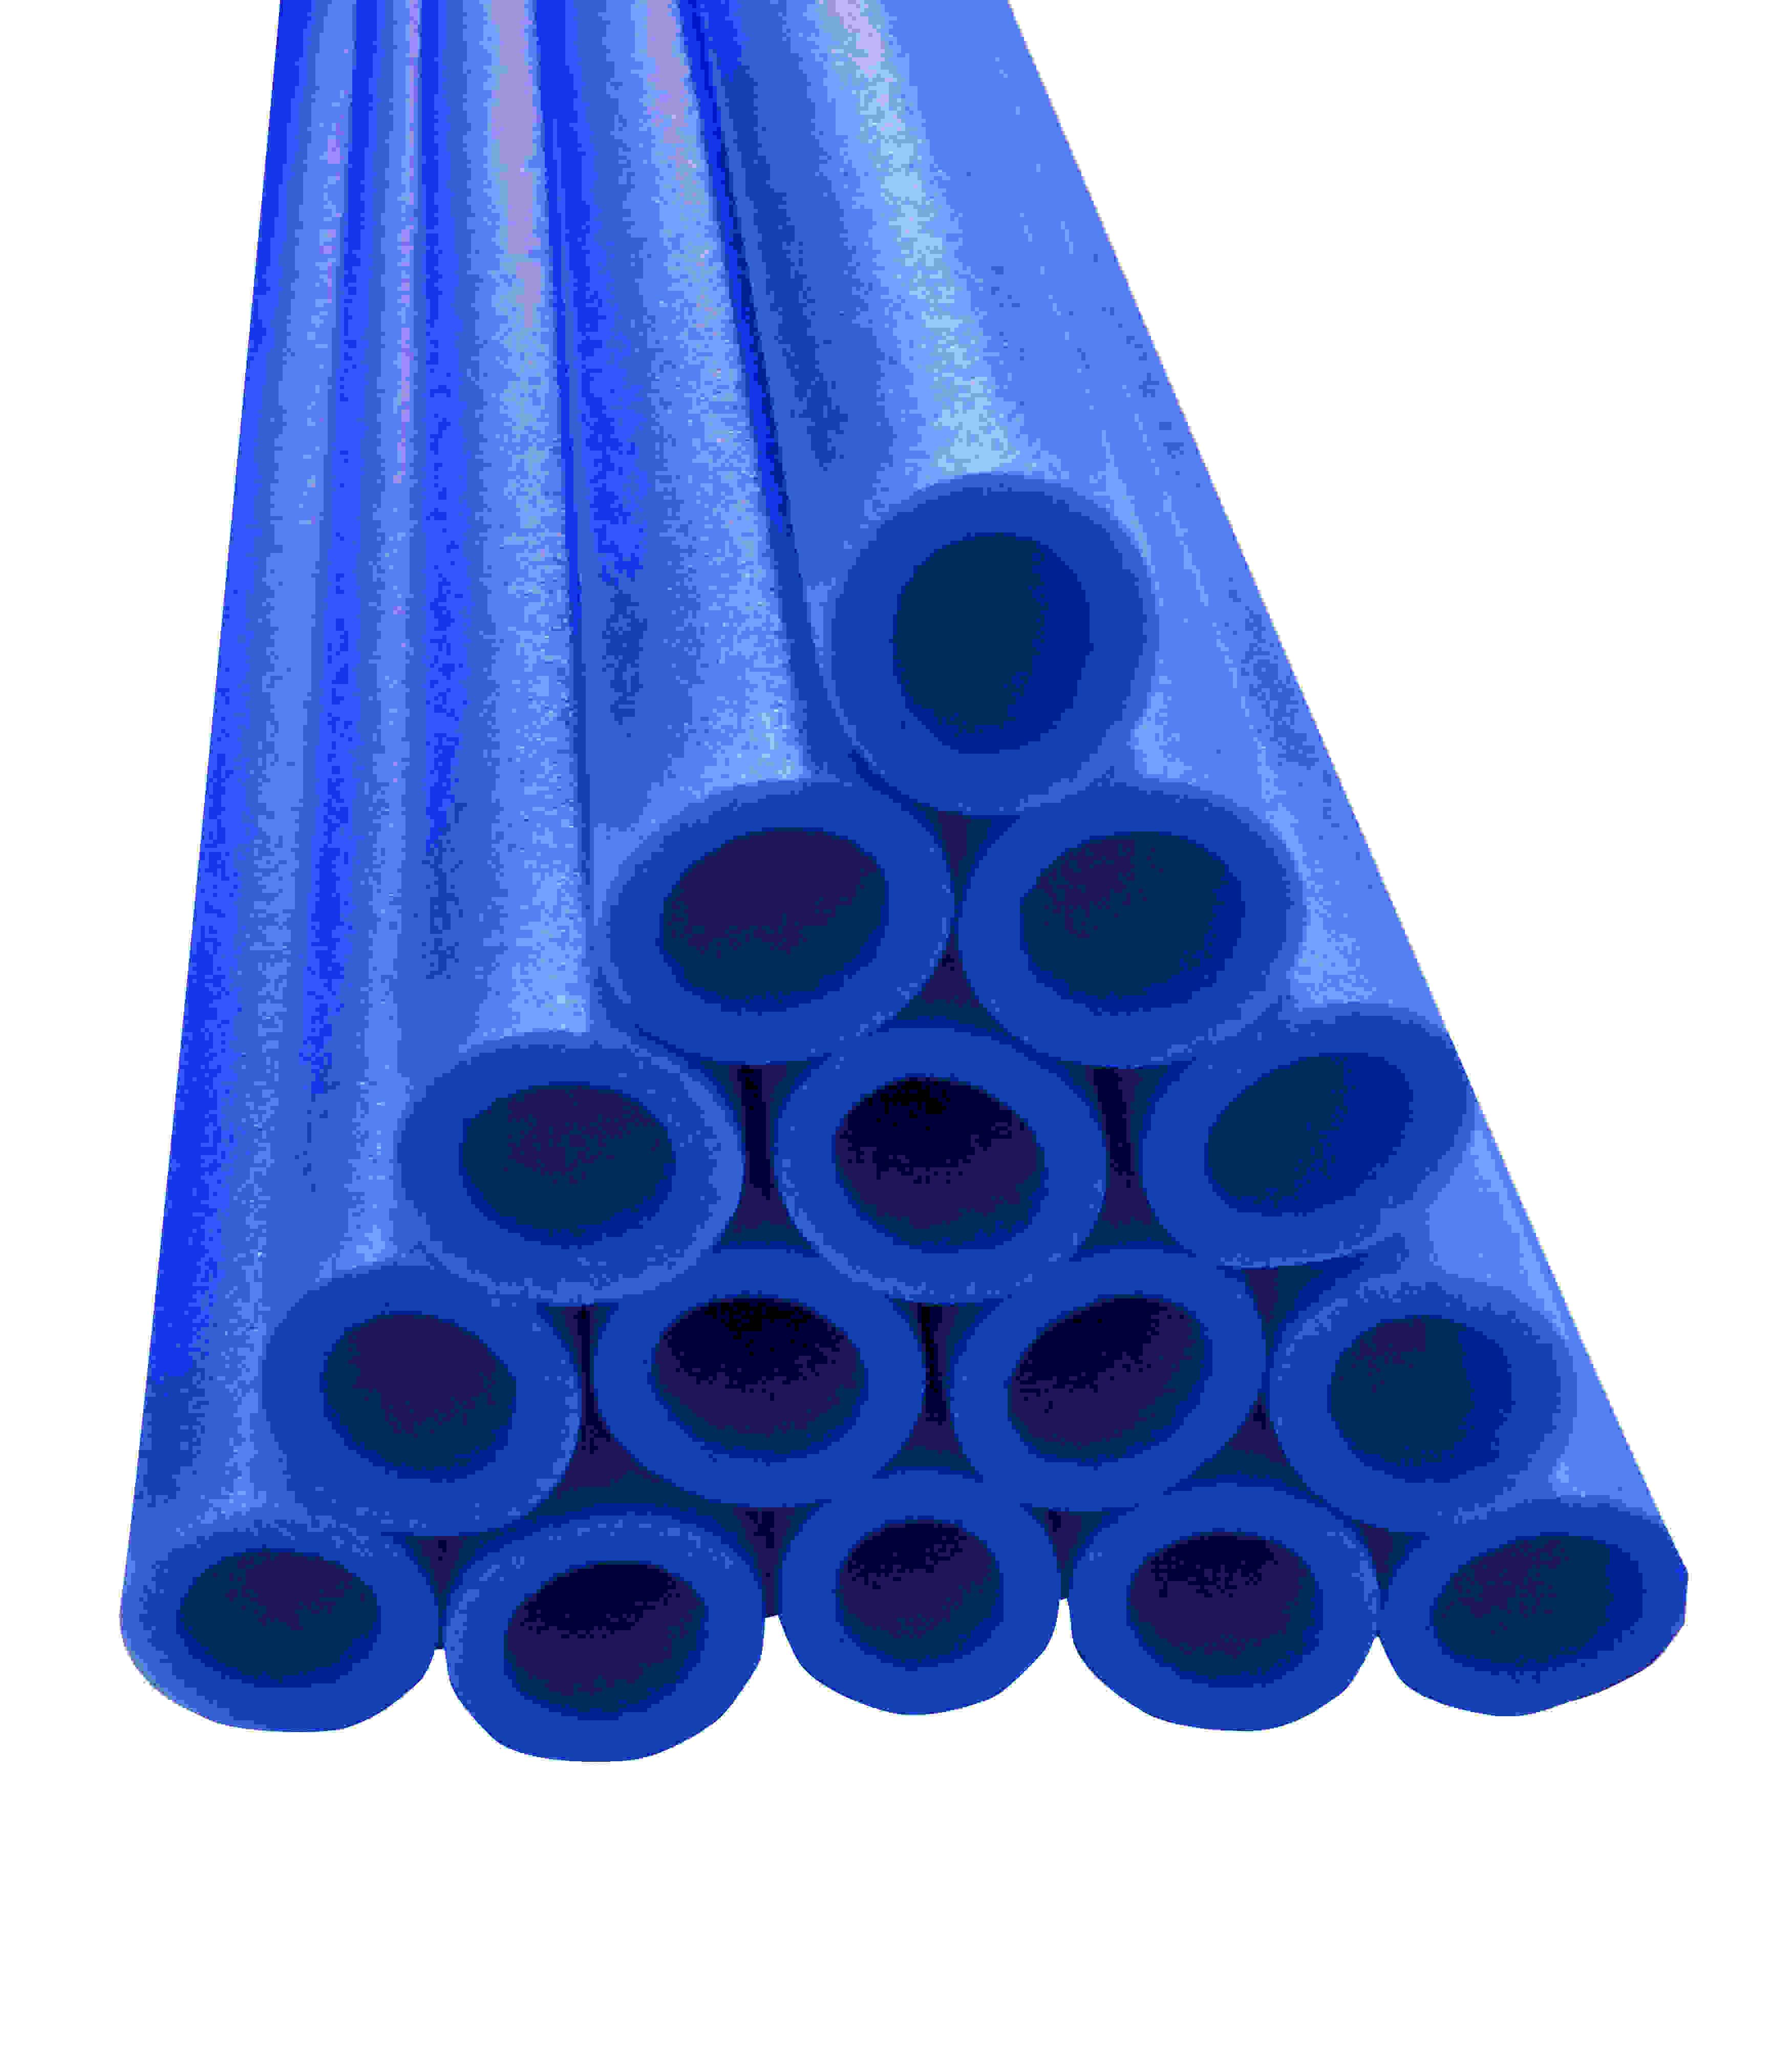 "37 Inch Trampoline Pole Foam sleeves, fits for 1"" Diameter Pole - Set of 12 -Blue"